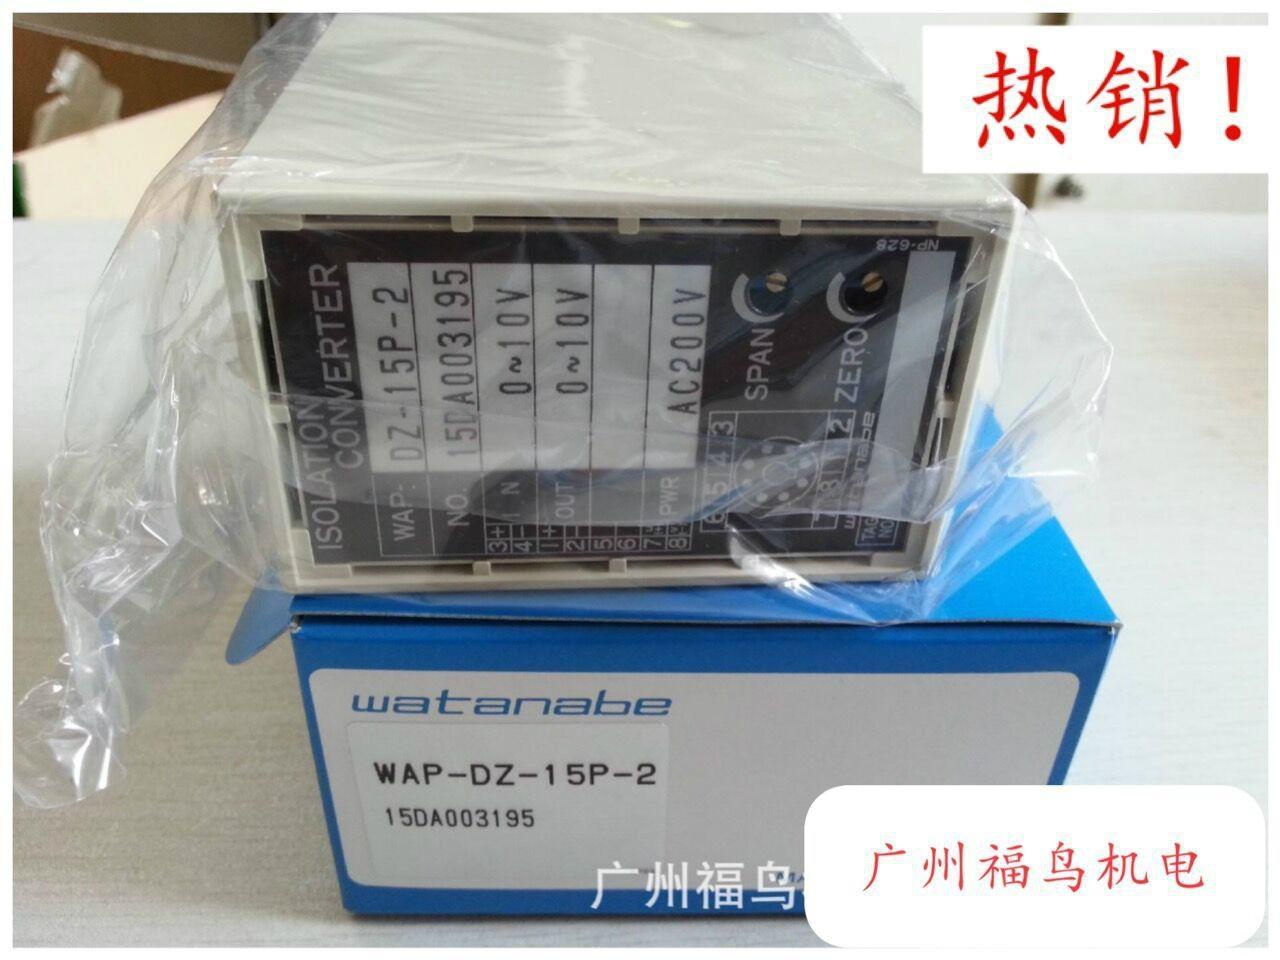 ?WATANABE信號轉換器, 型號: WAP-DZ-15P-2